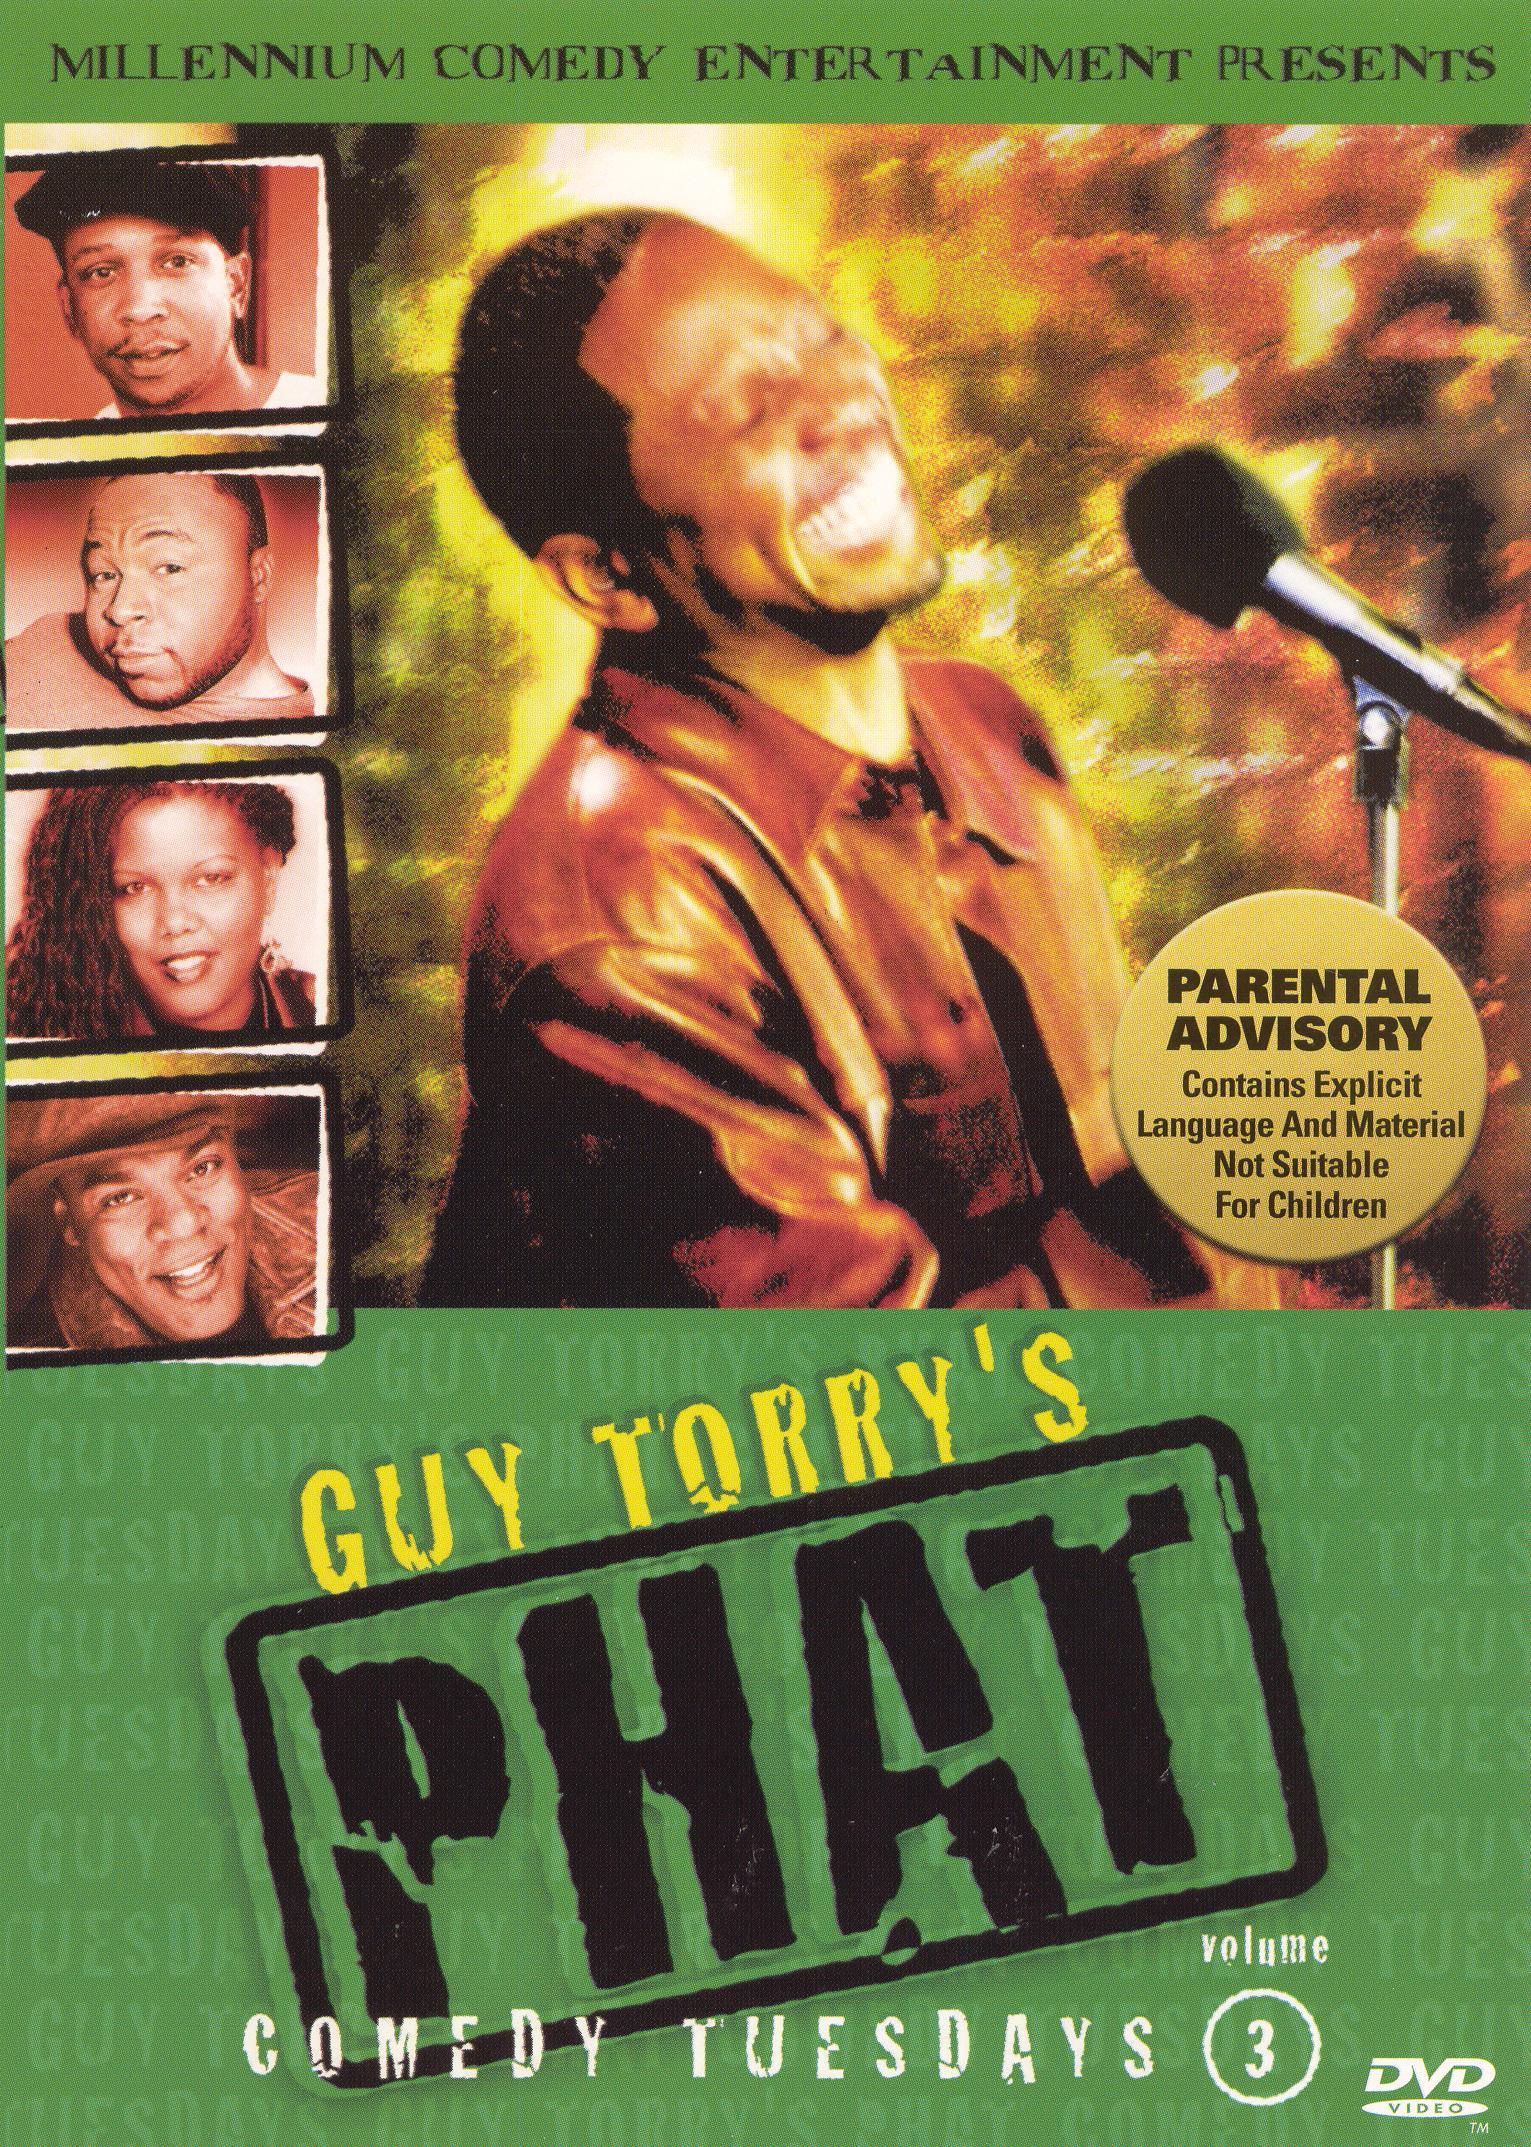 Phat Comedy Tuesdays, Vol. 3